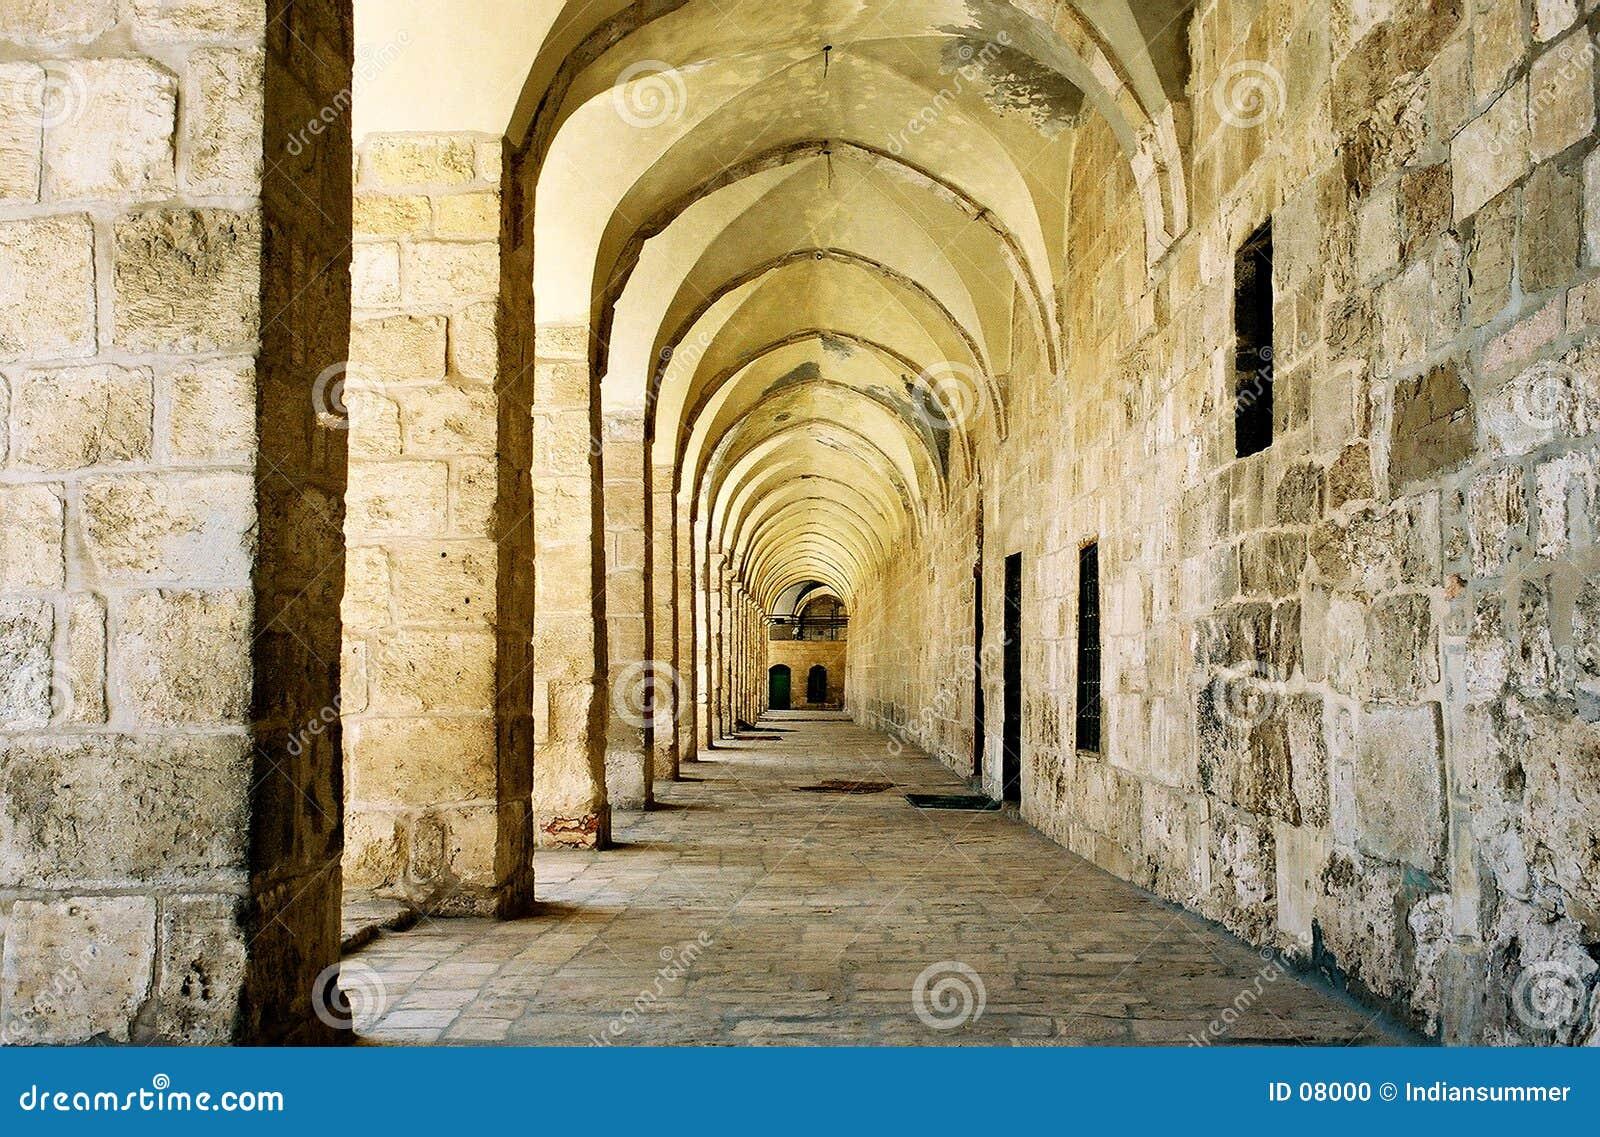 Arcade in Jeruzalem.